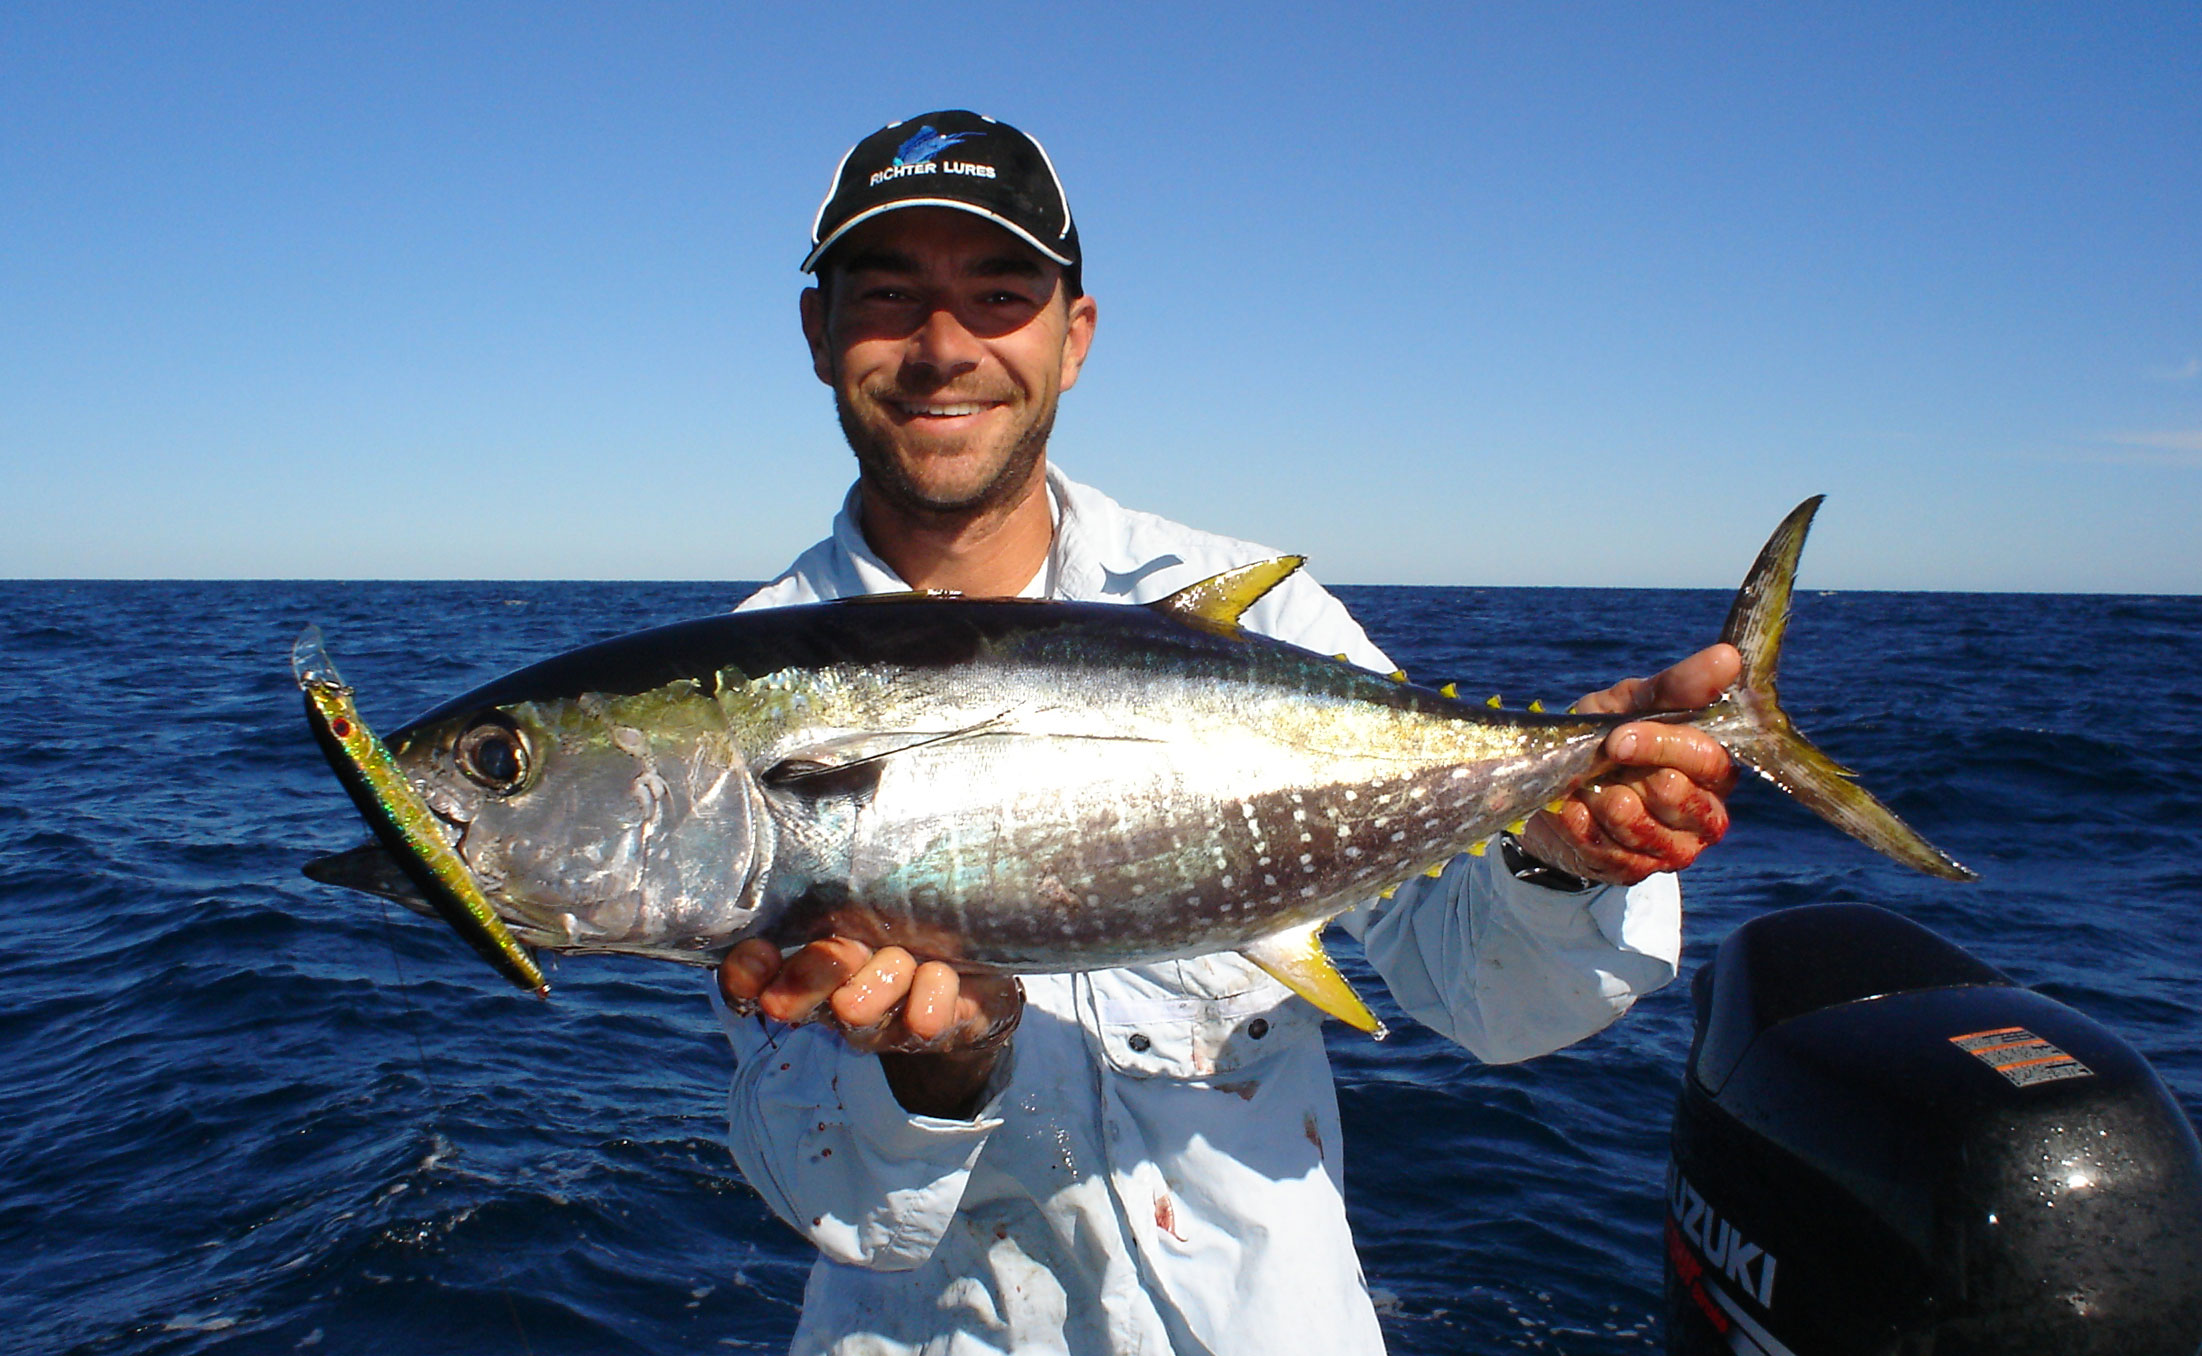 Nick Hocking with a Yellowfin Tuna